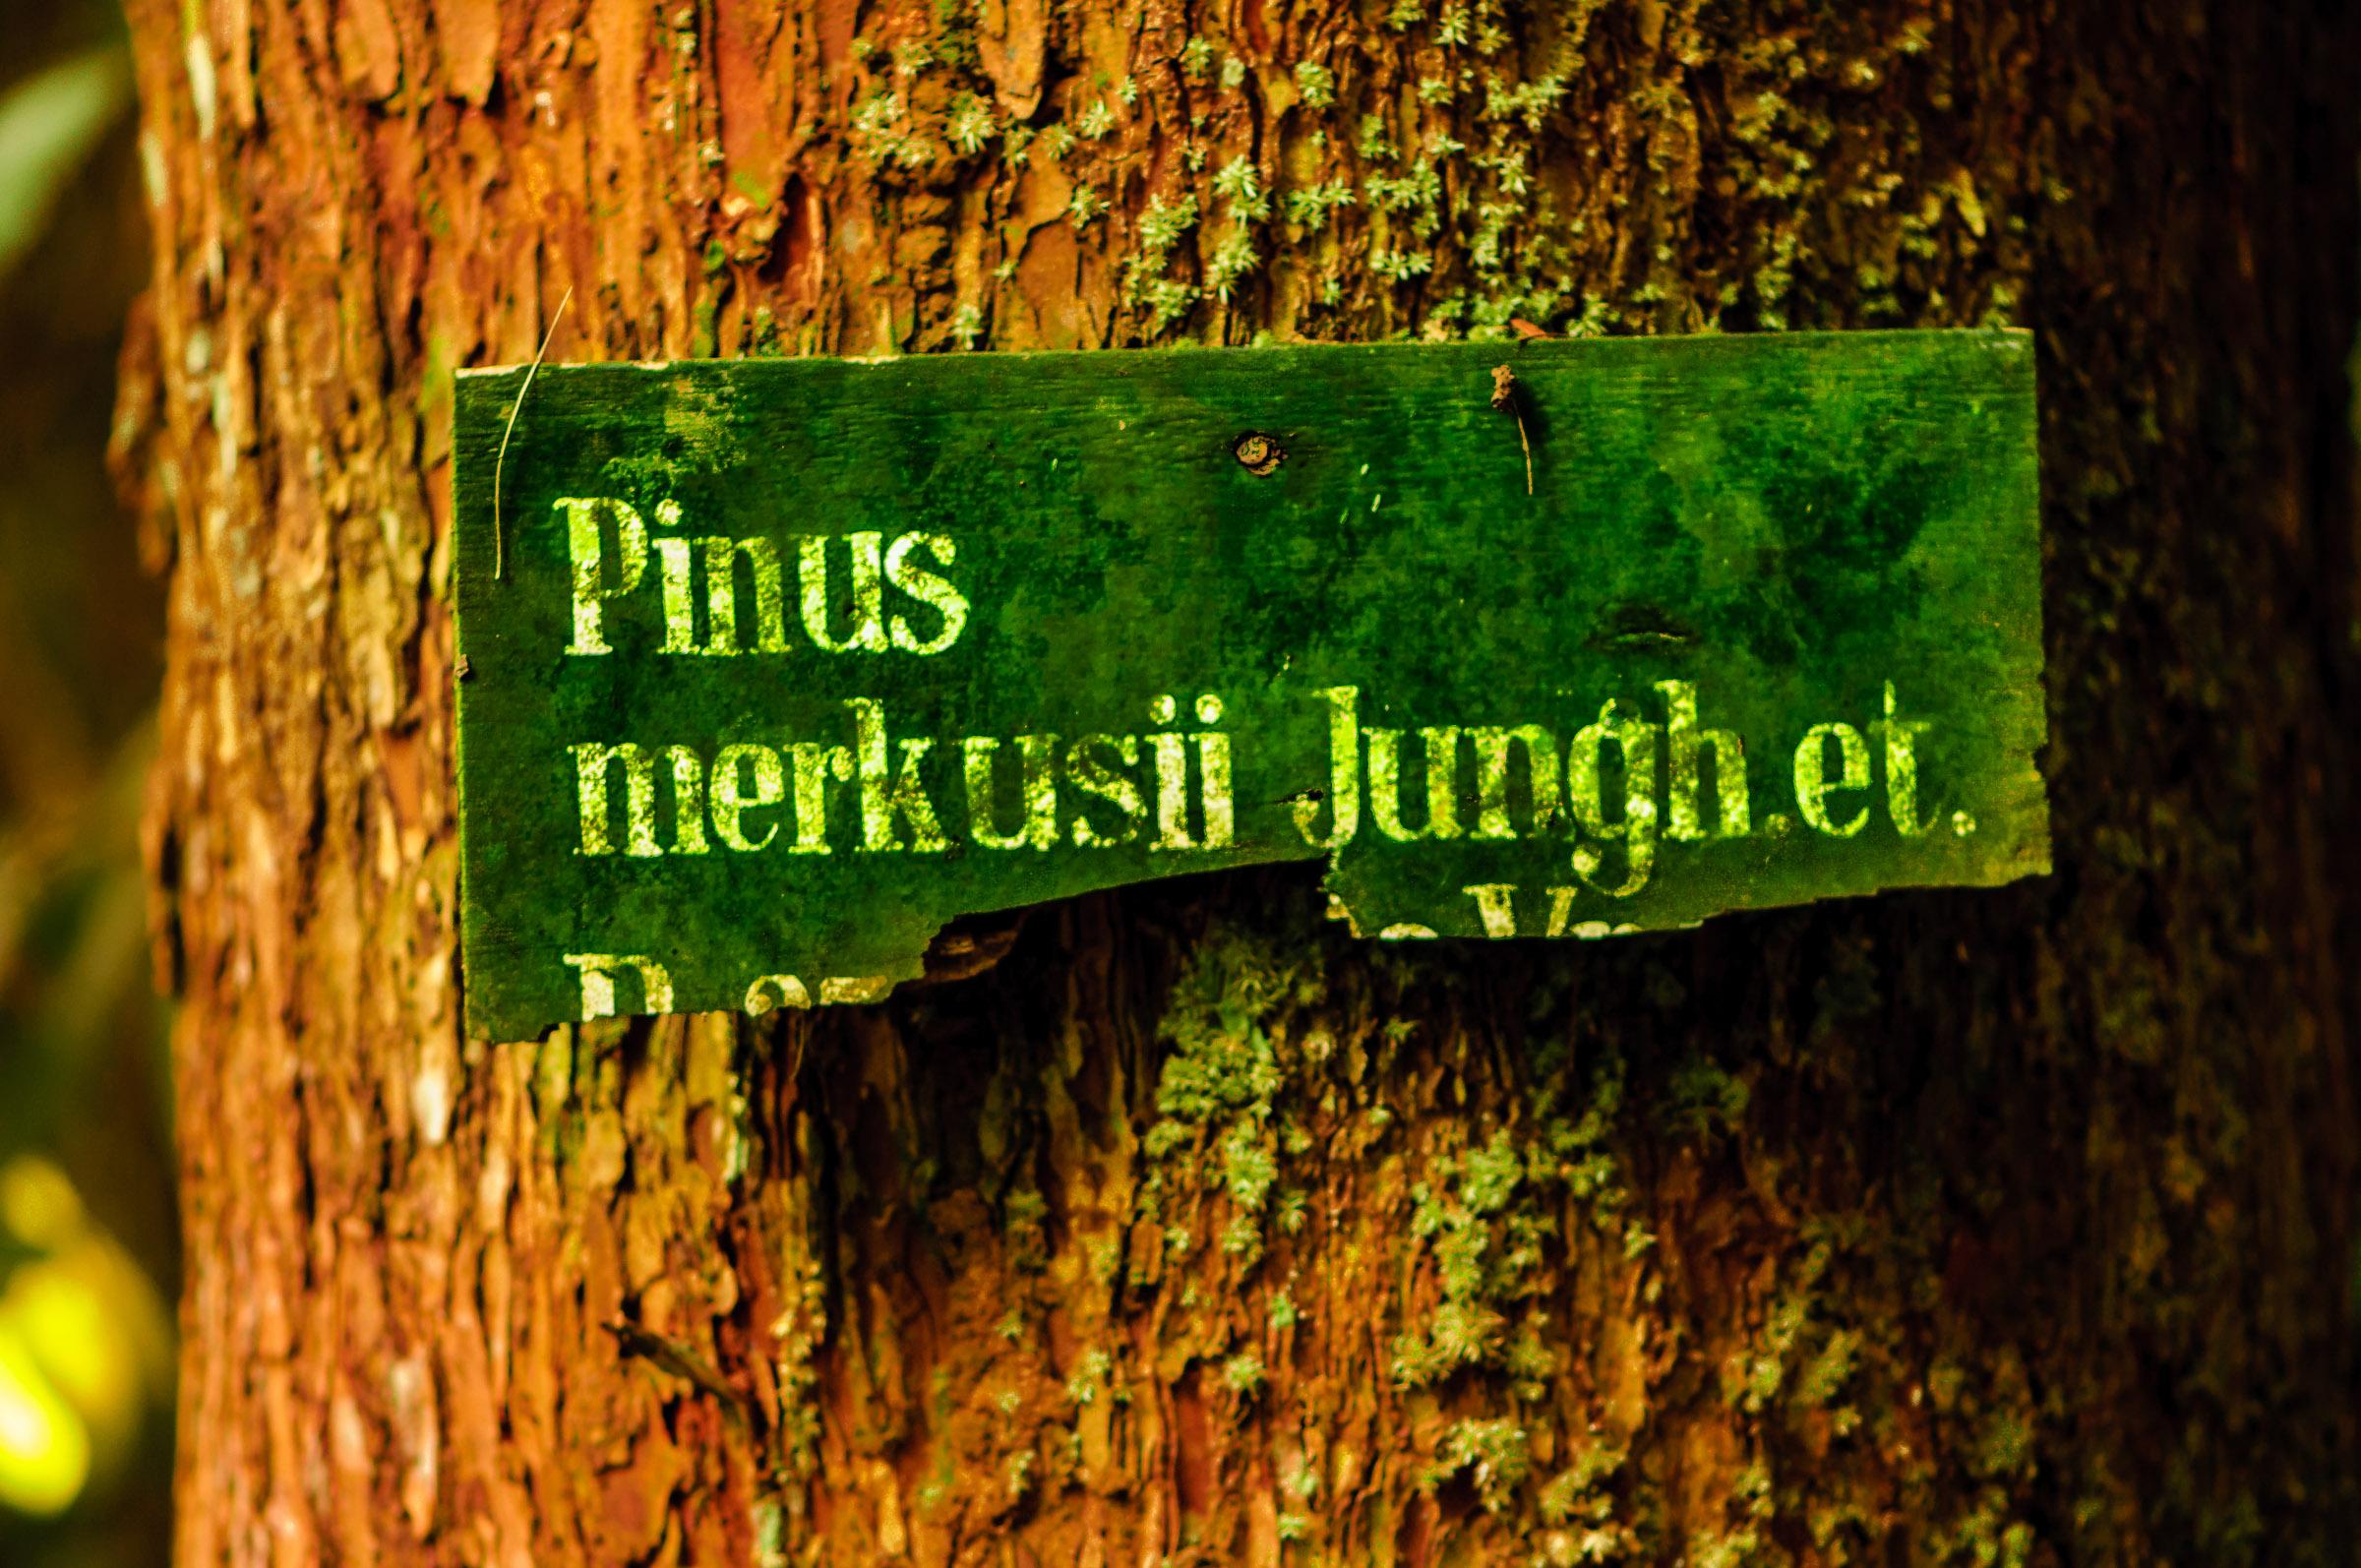 CIFOR Pinus - Iksa Menajang